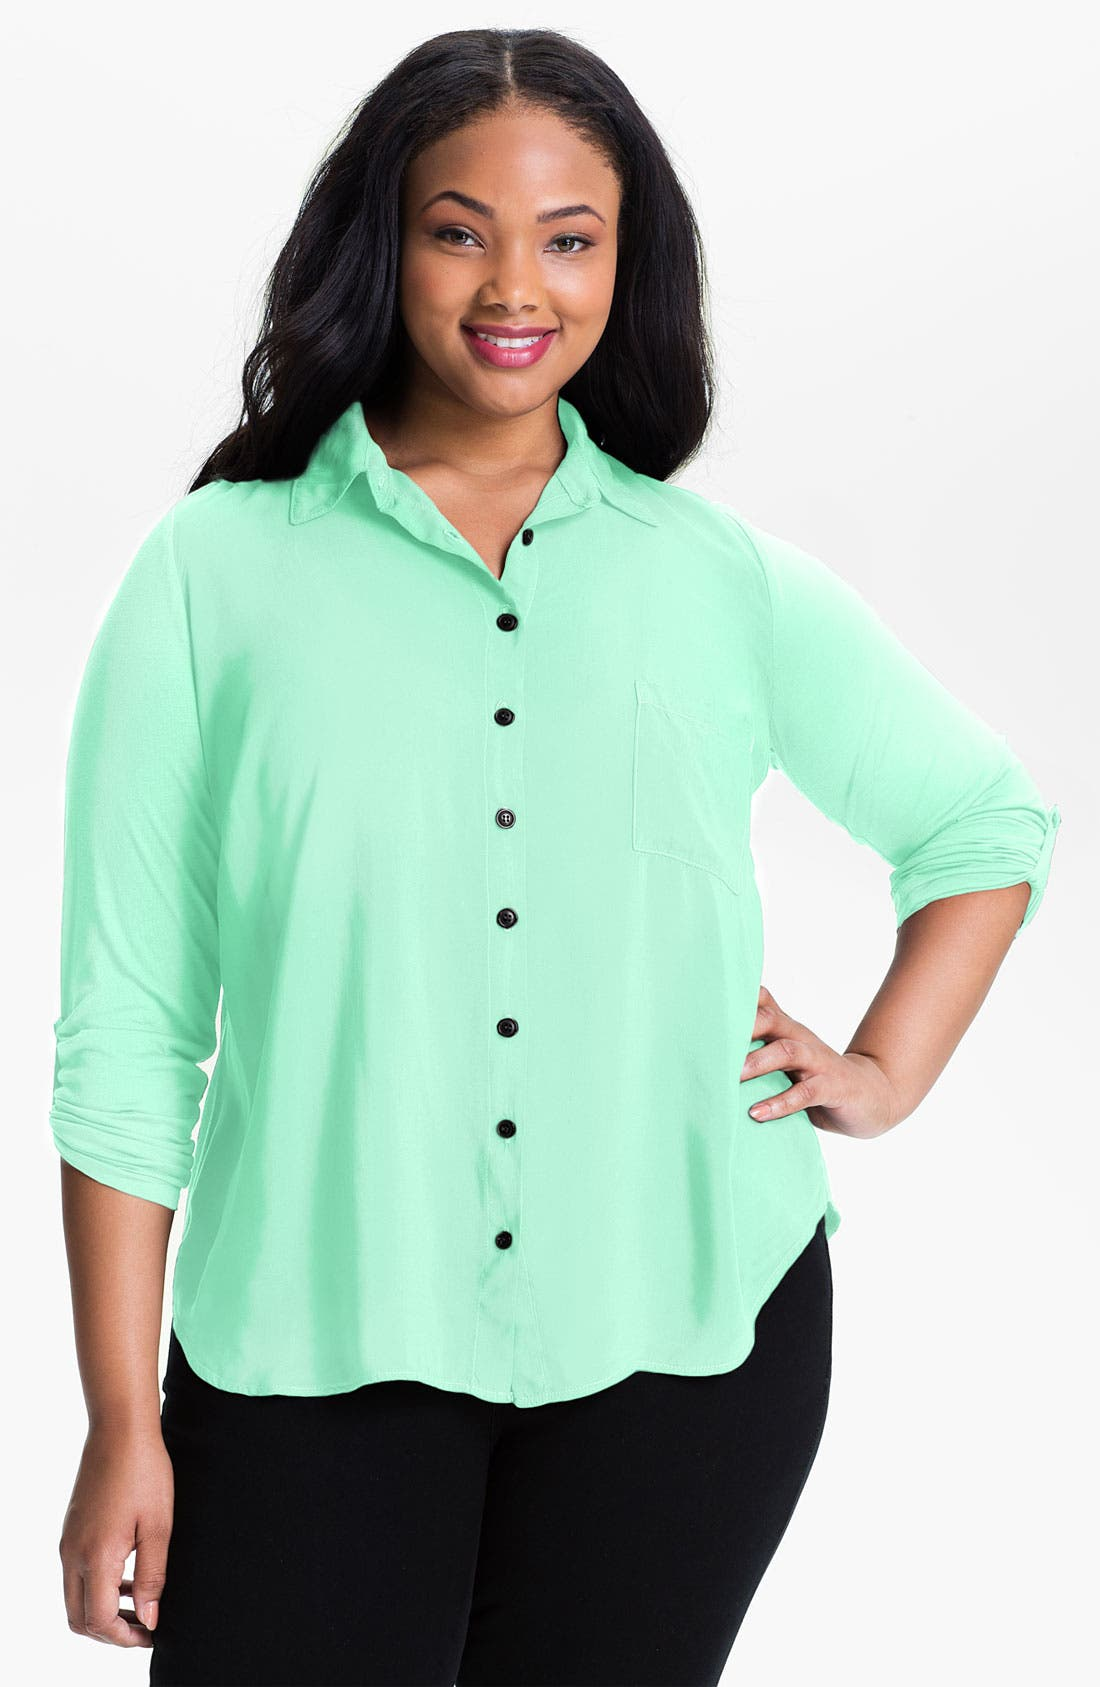 Alternate Image 1 Selected - Splendid Mixed Media Shirt (Plus Size)